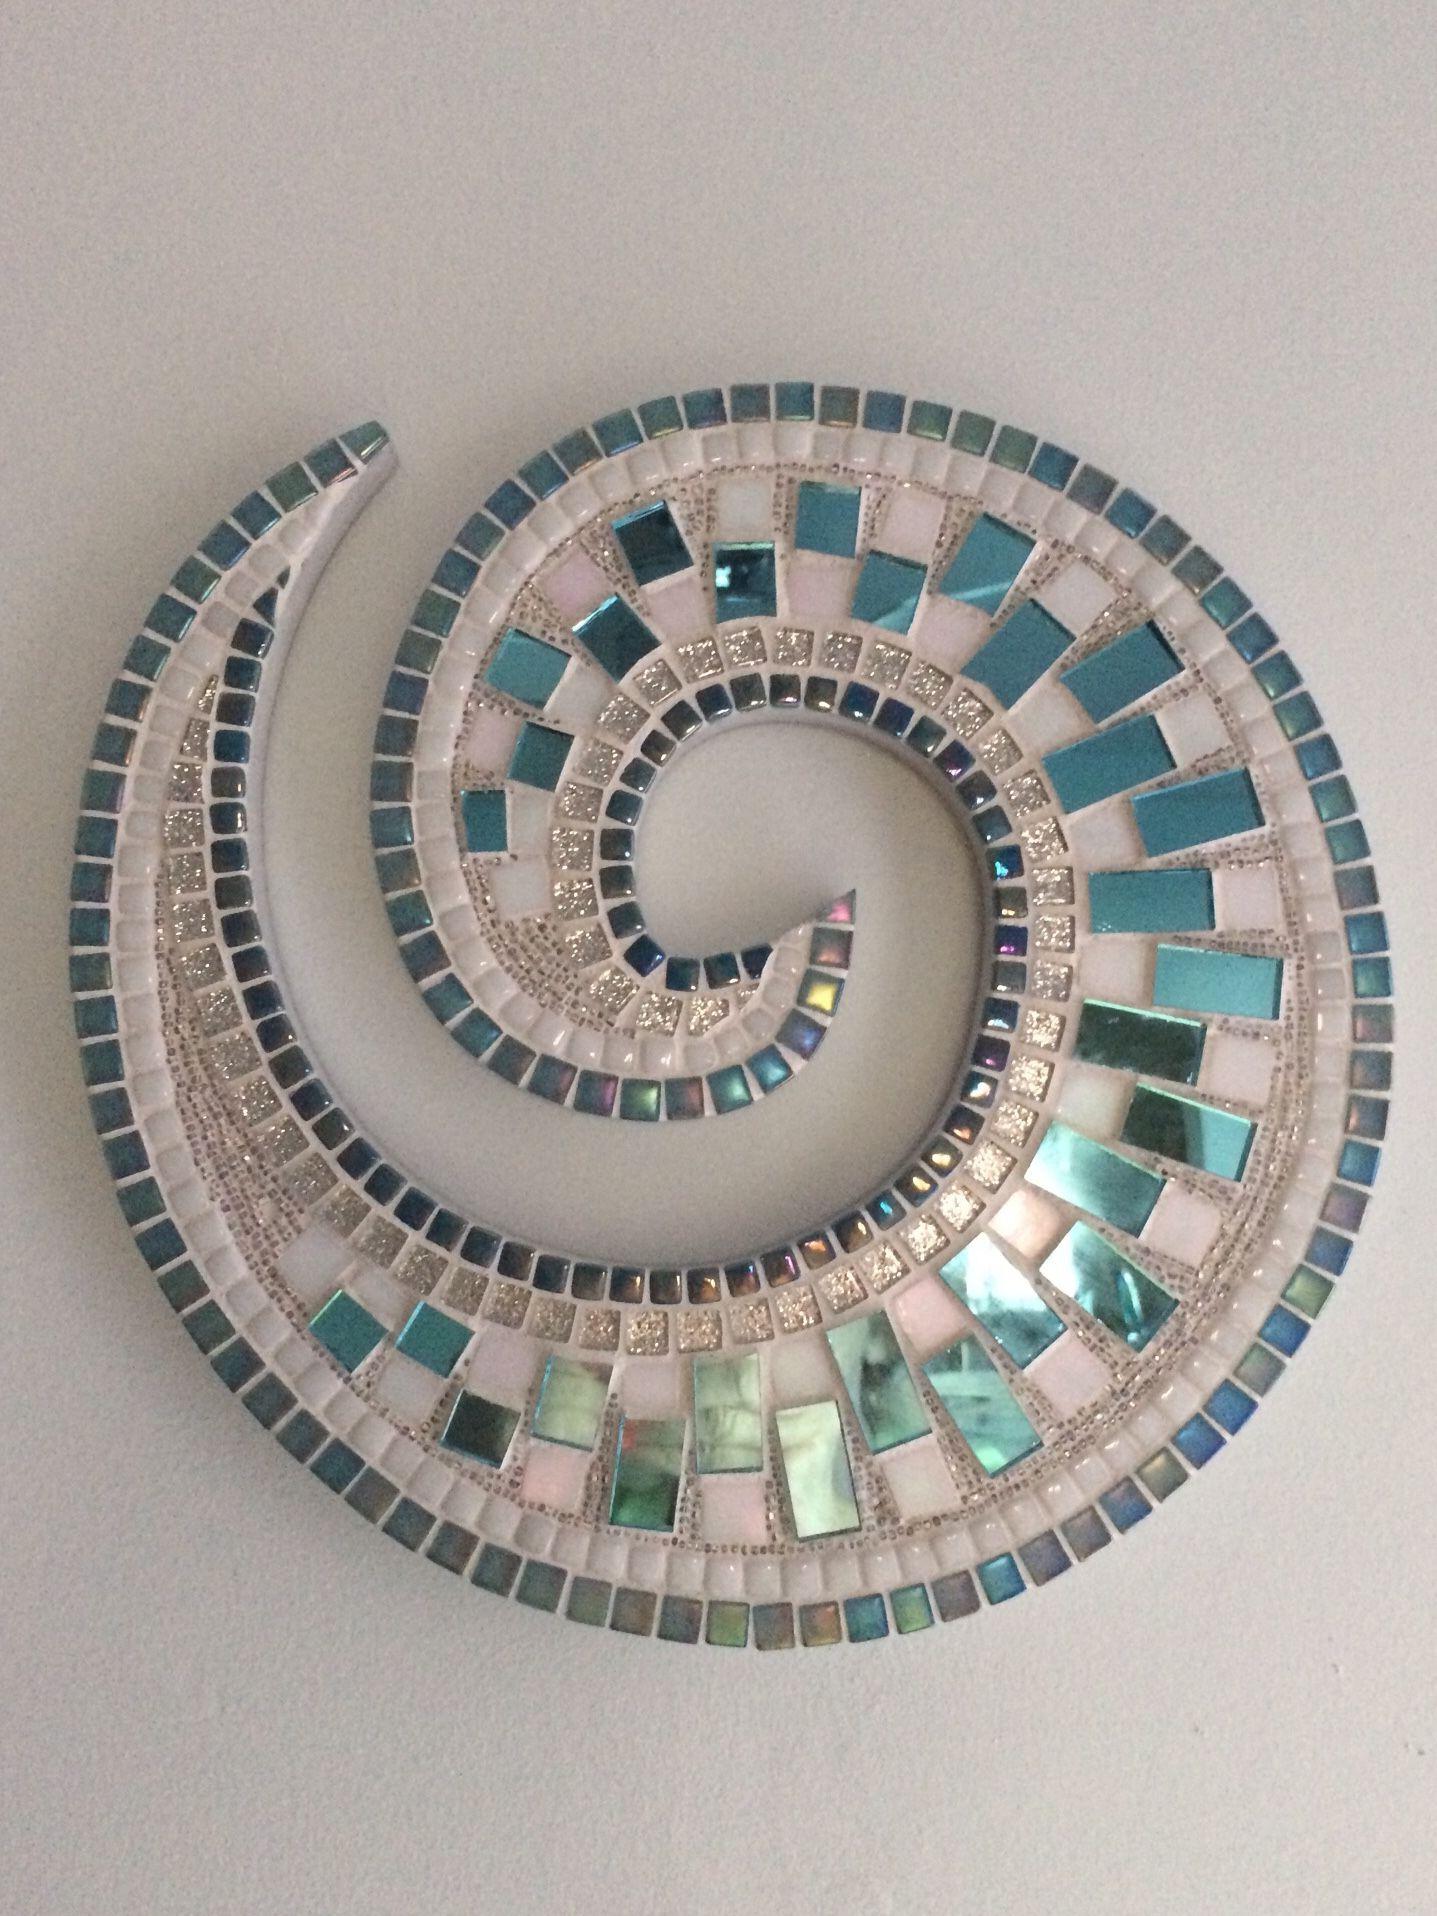 Pin de Norma Sichau en Mosaicoshttp://walmart.com-gratuito.net ...